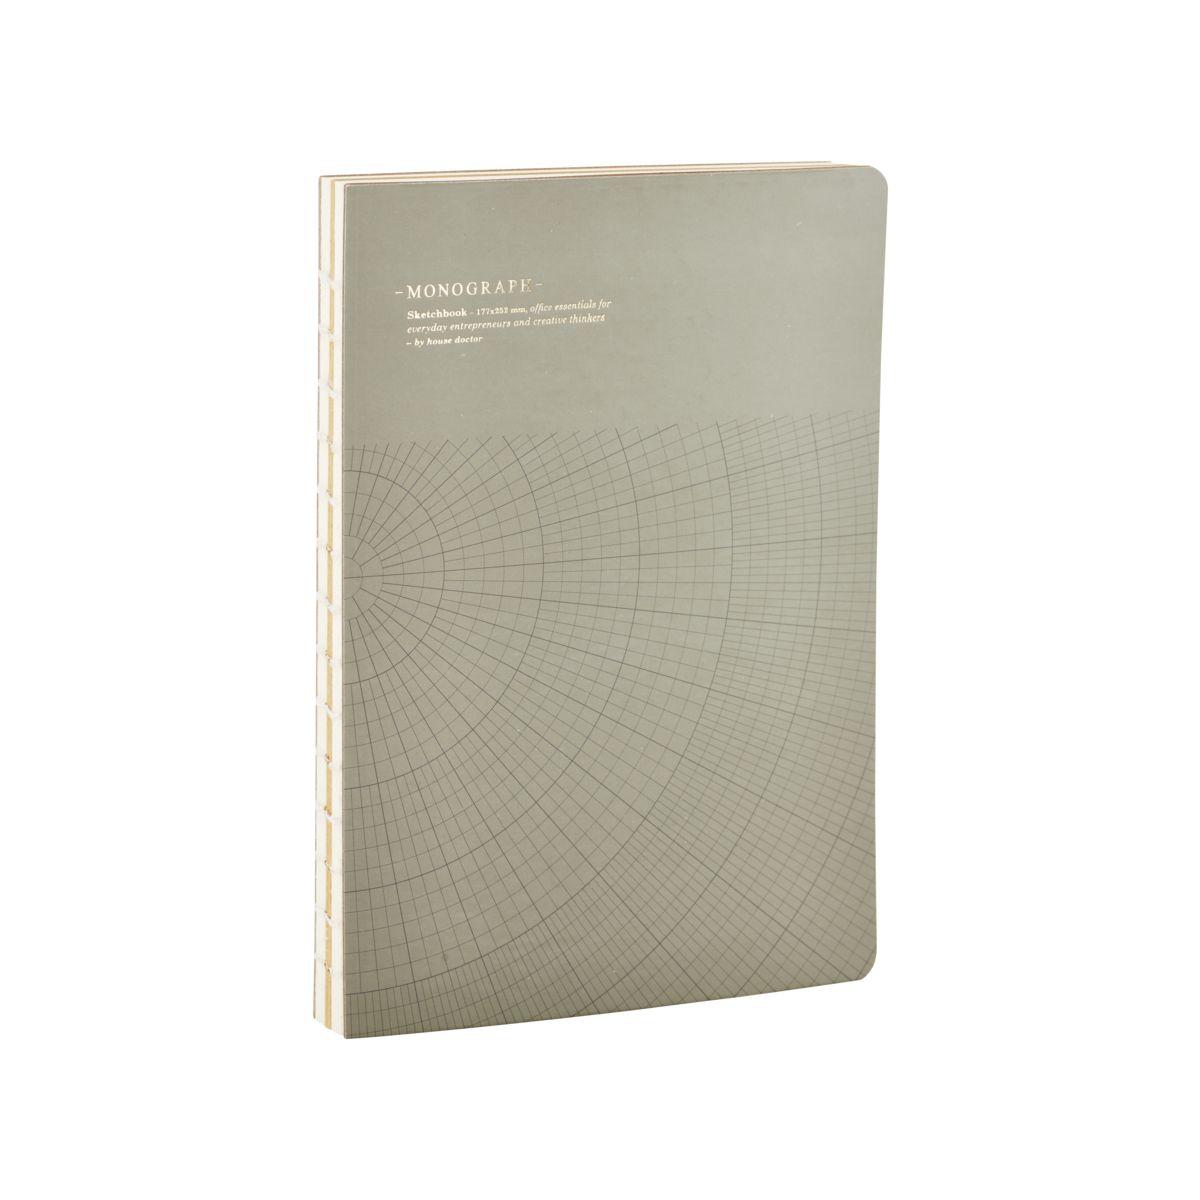 hd aw16 mgsj030 psh - Notatbok - Geometrisk